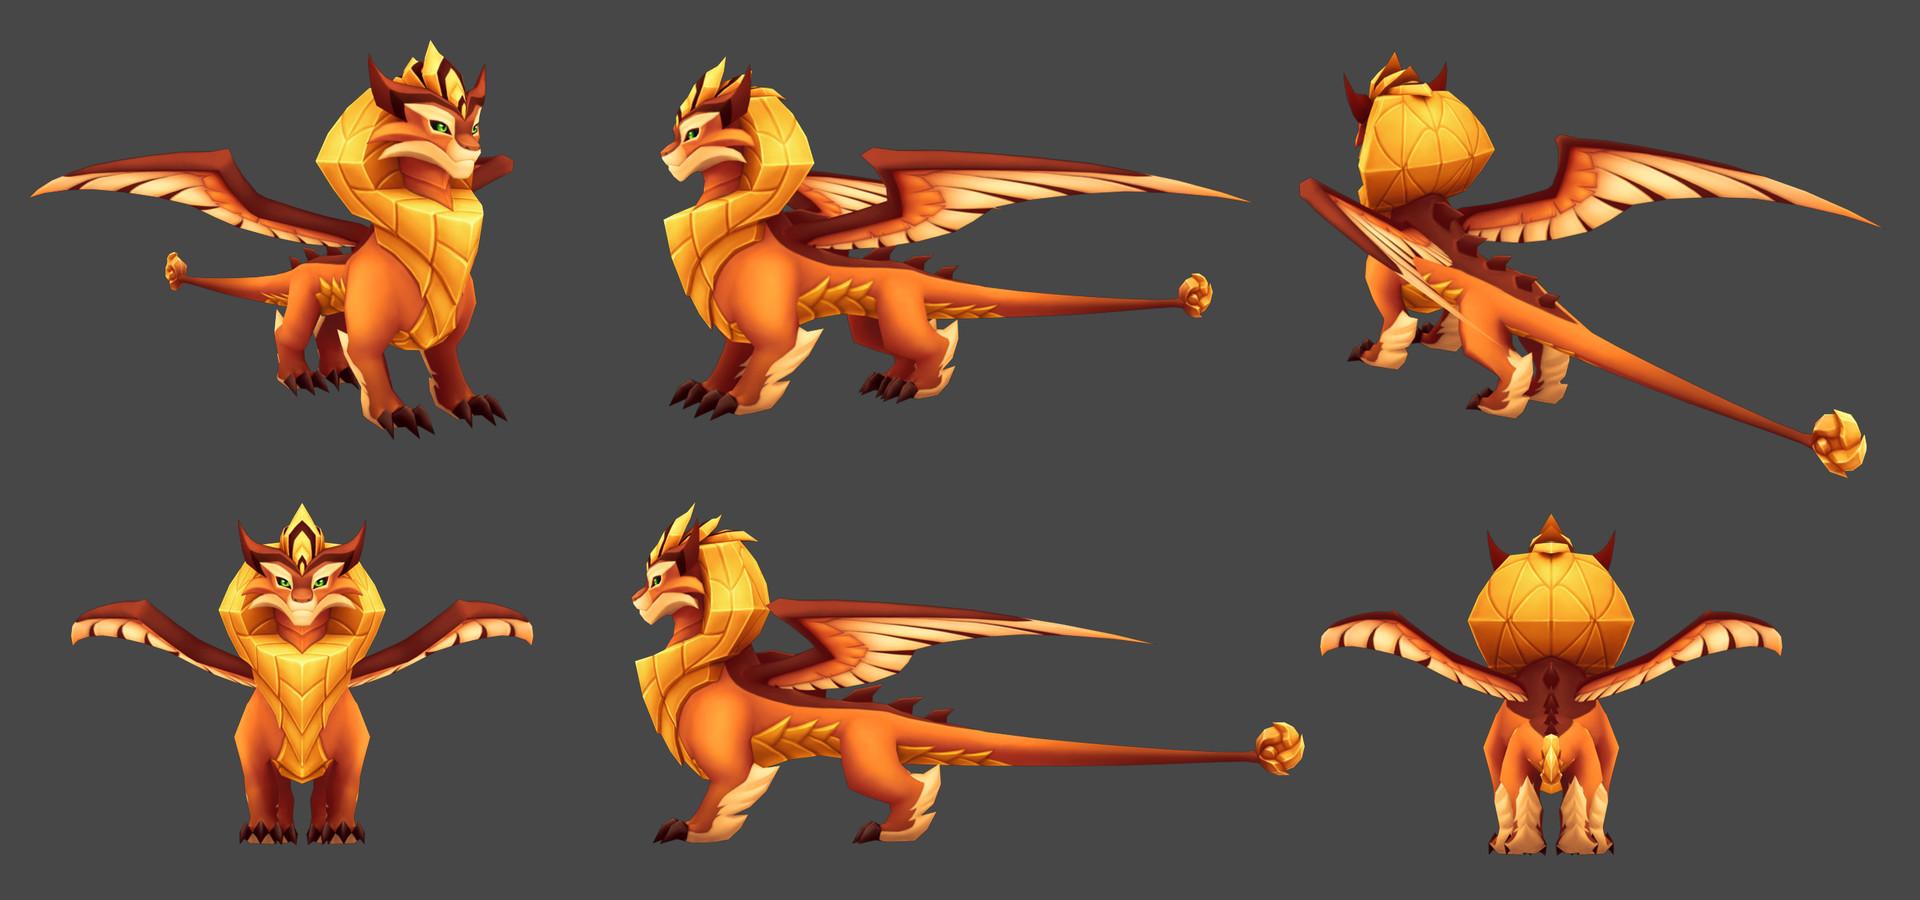 ArtStation - DragonVale World Leia Zodiac Dragon, Adam Roark